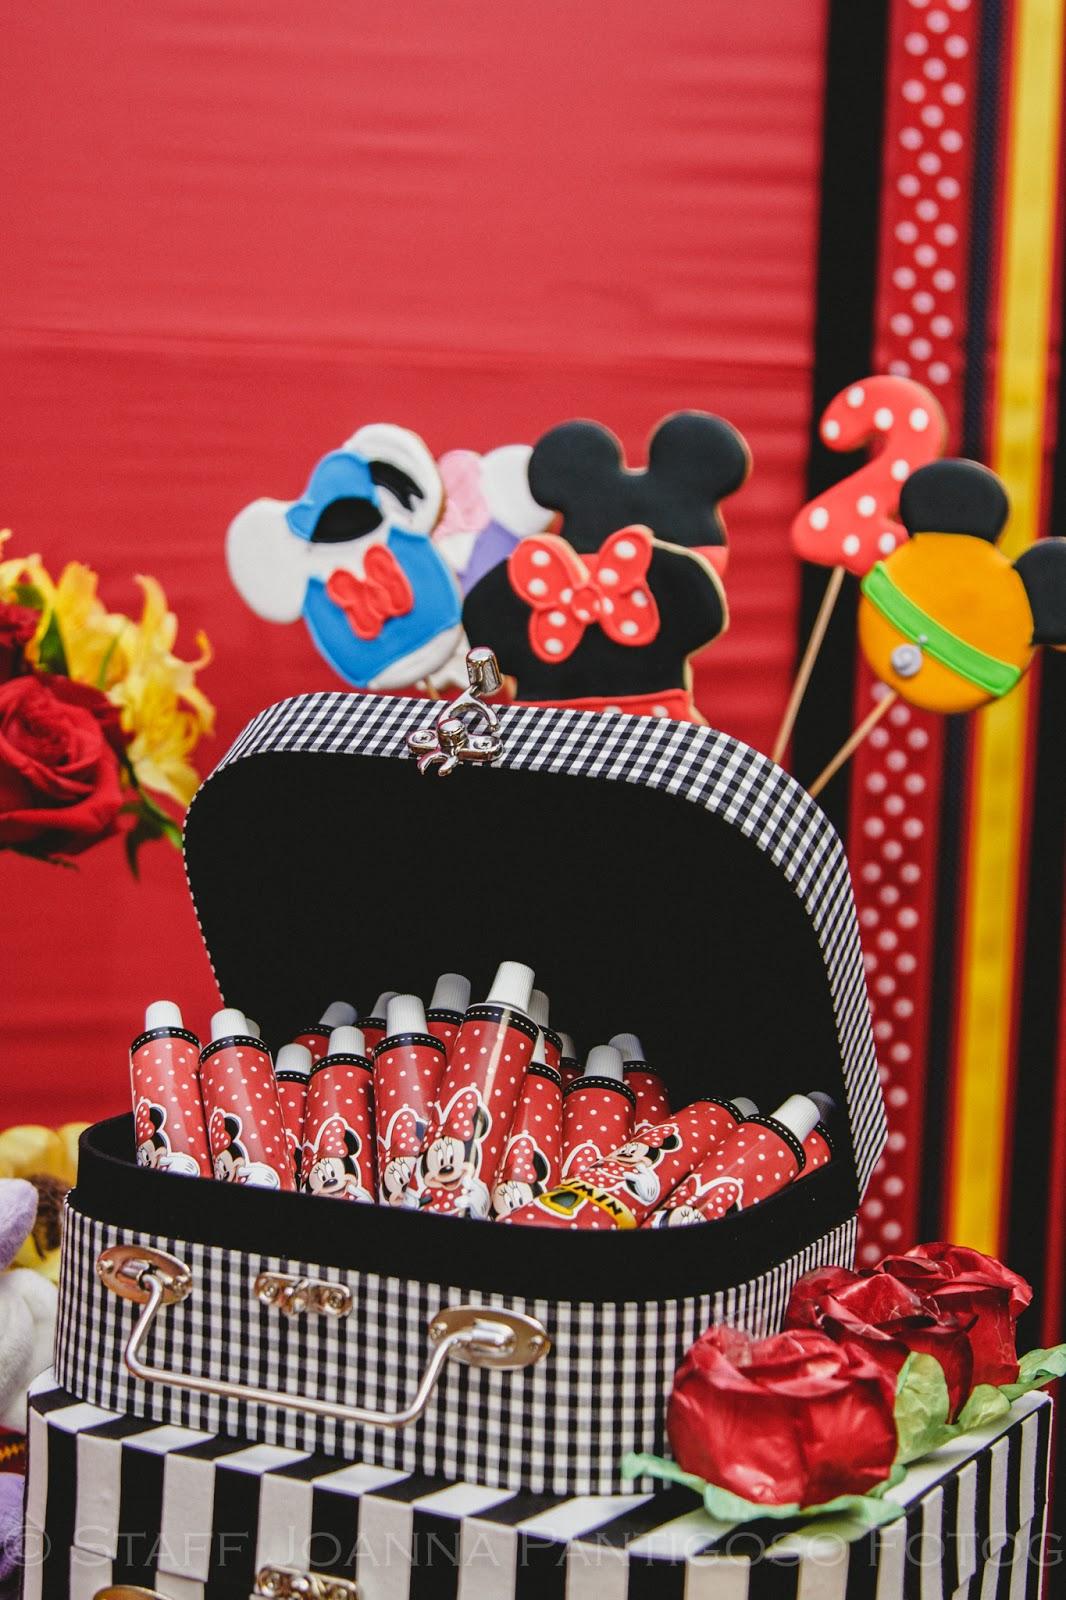 Inspiracin  Decoracin Mickey  Minnie Mouse  Small Place Coffee  Fun  Pink Decor  Fiesta